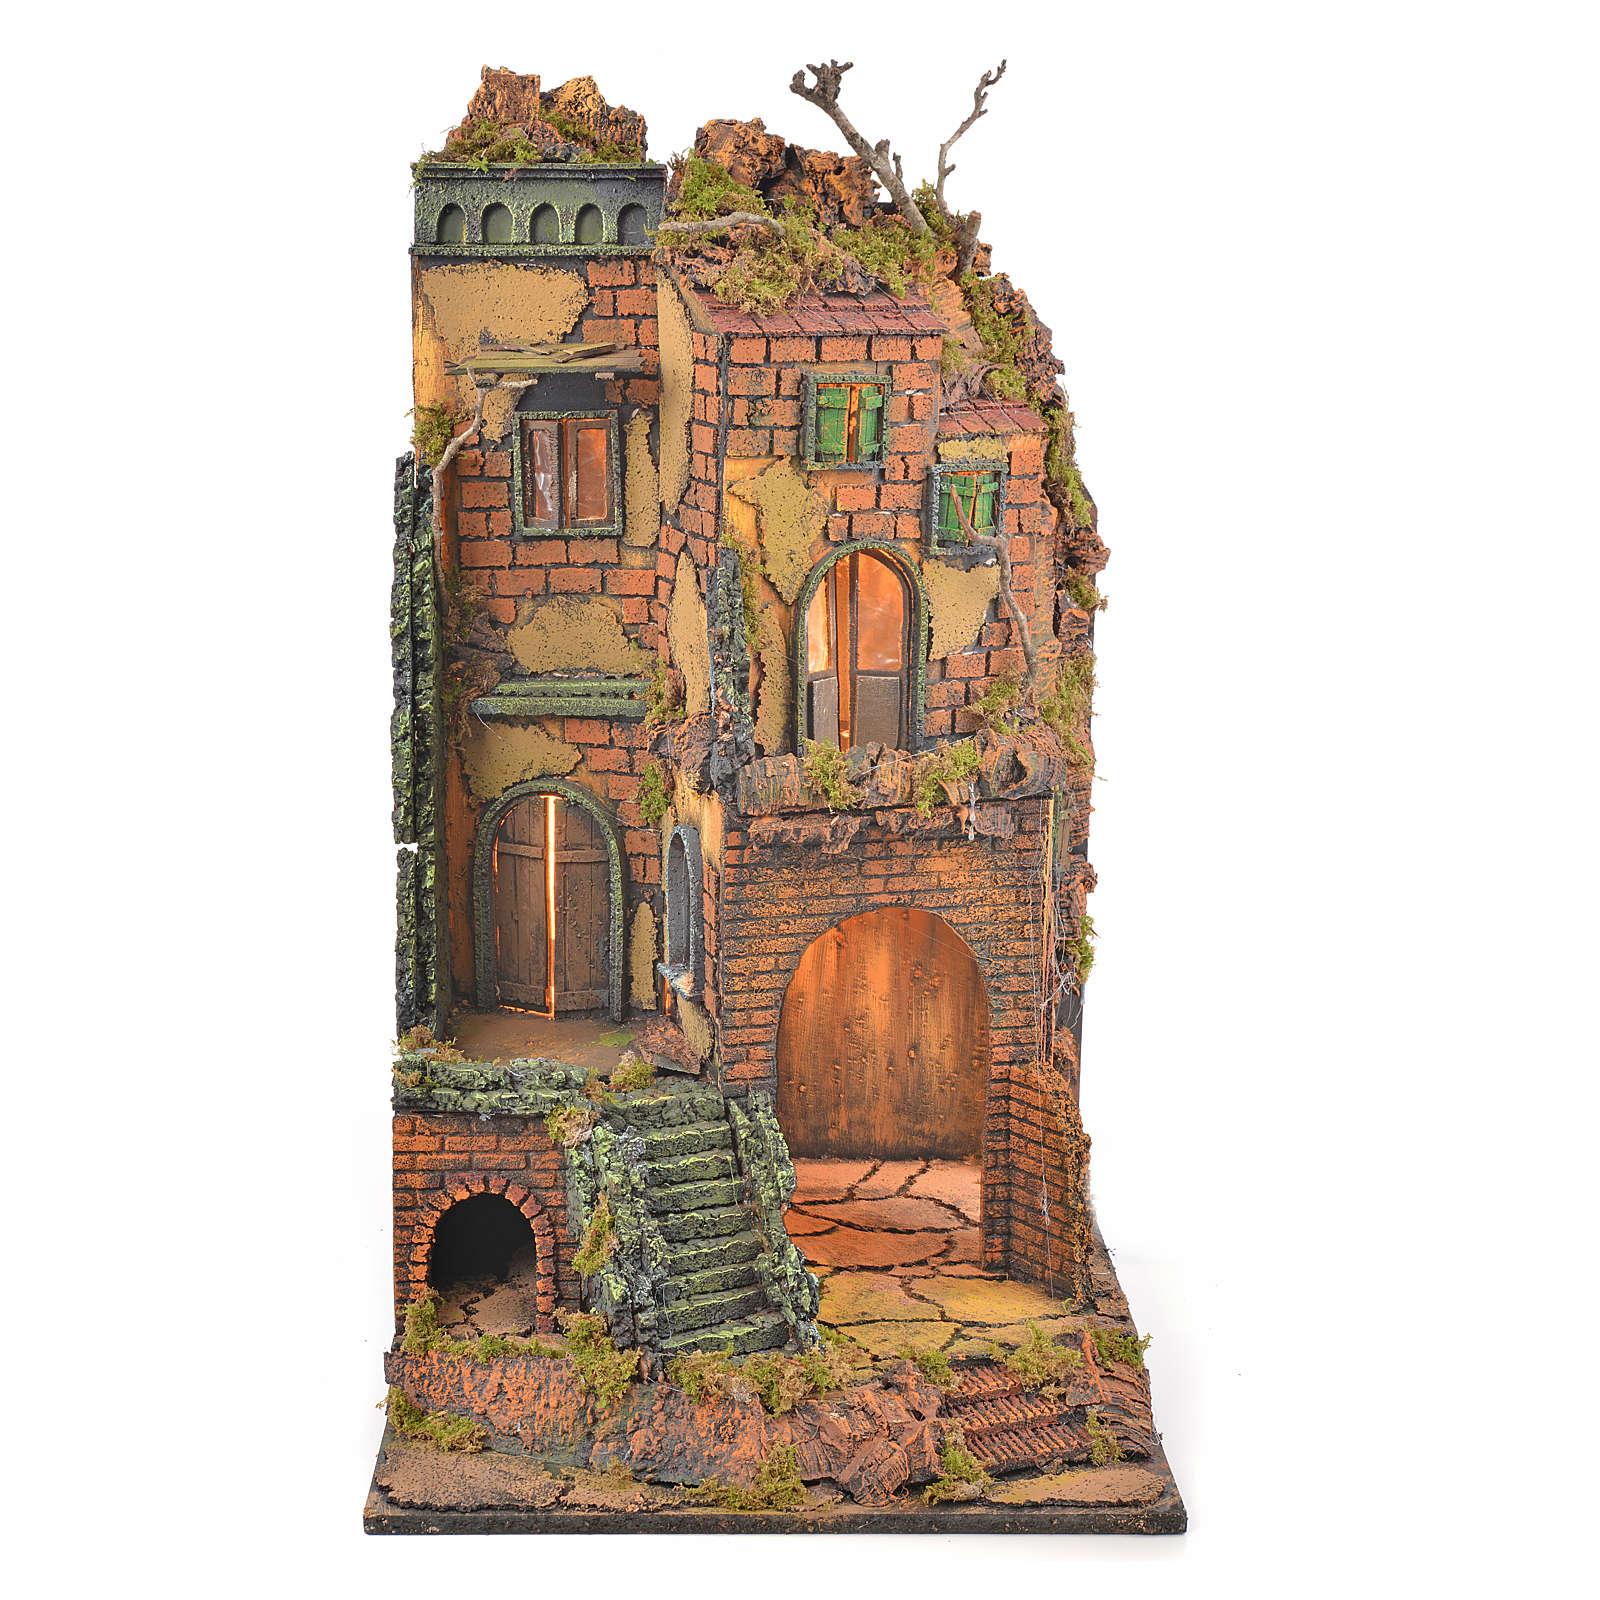 Borgo presepe napoletano stile 700 torre scale luce 65x45x37 4